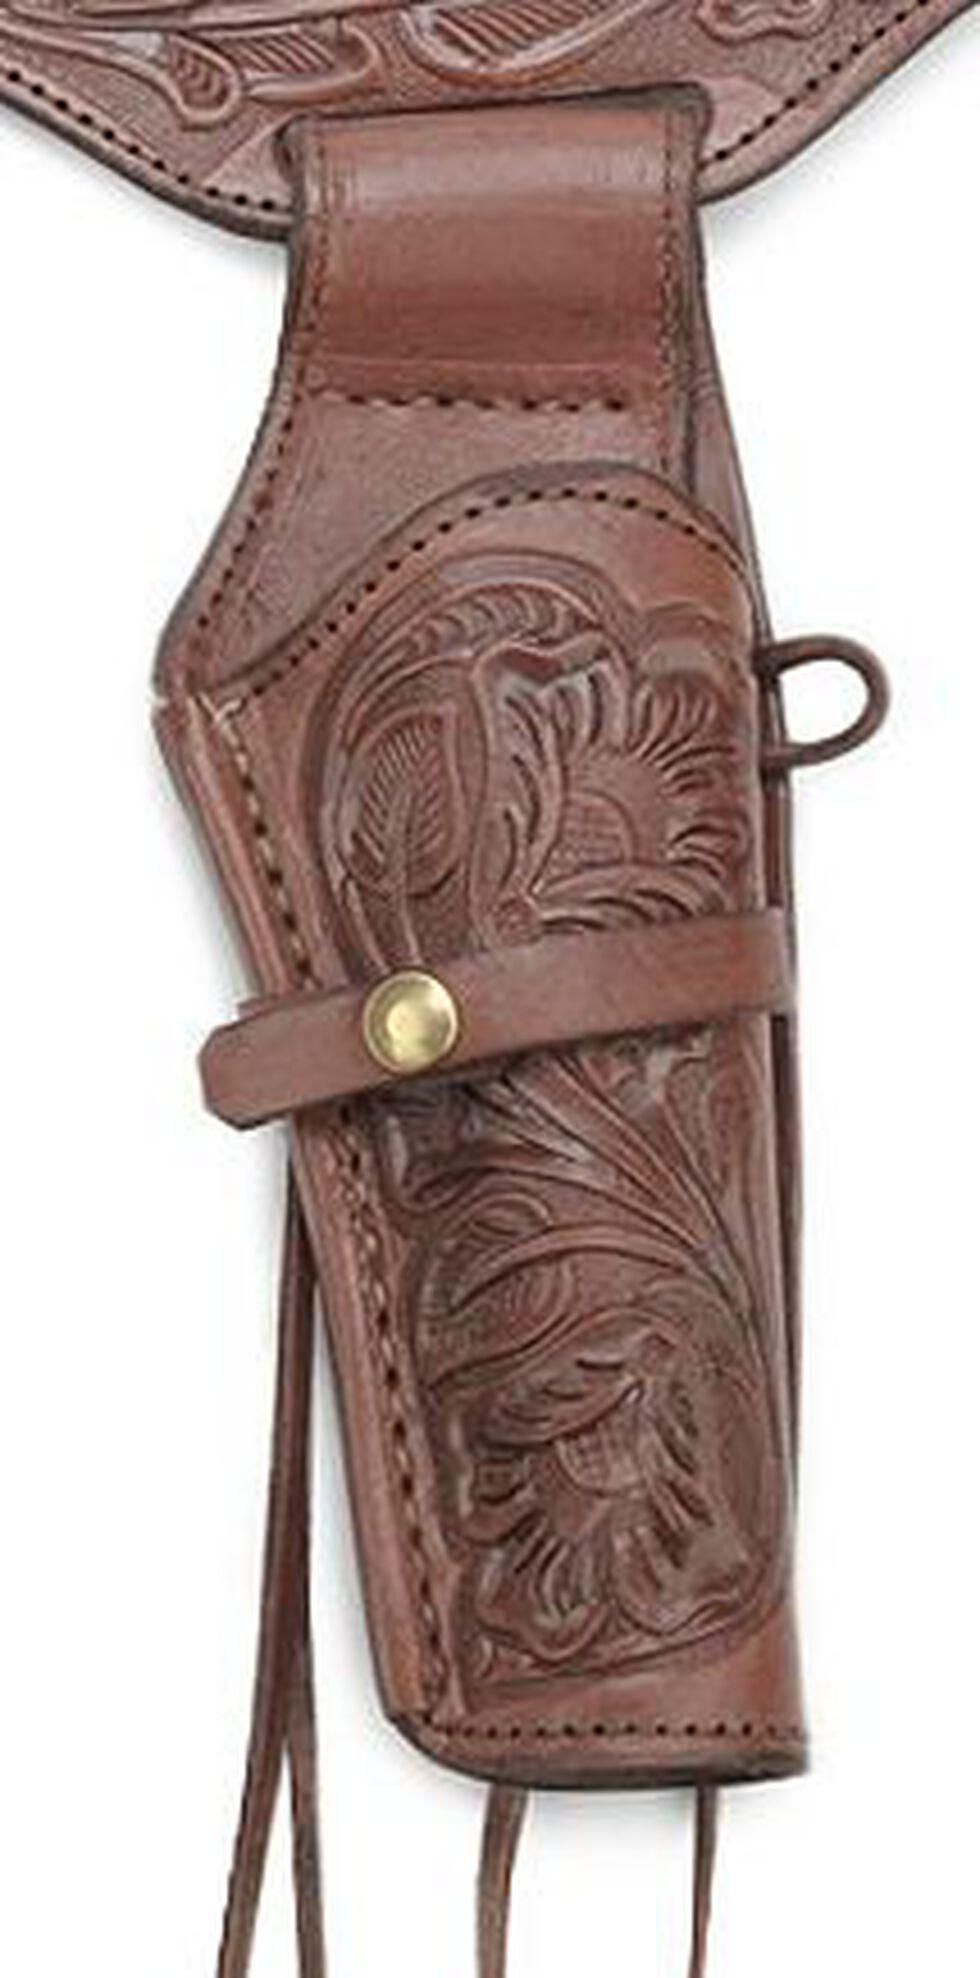 Western Express .45 Caliber Hand Tooled Leather Single-Gun Belt & Holster, Chocolate, hi-res